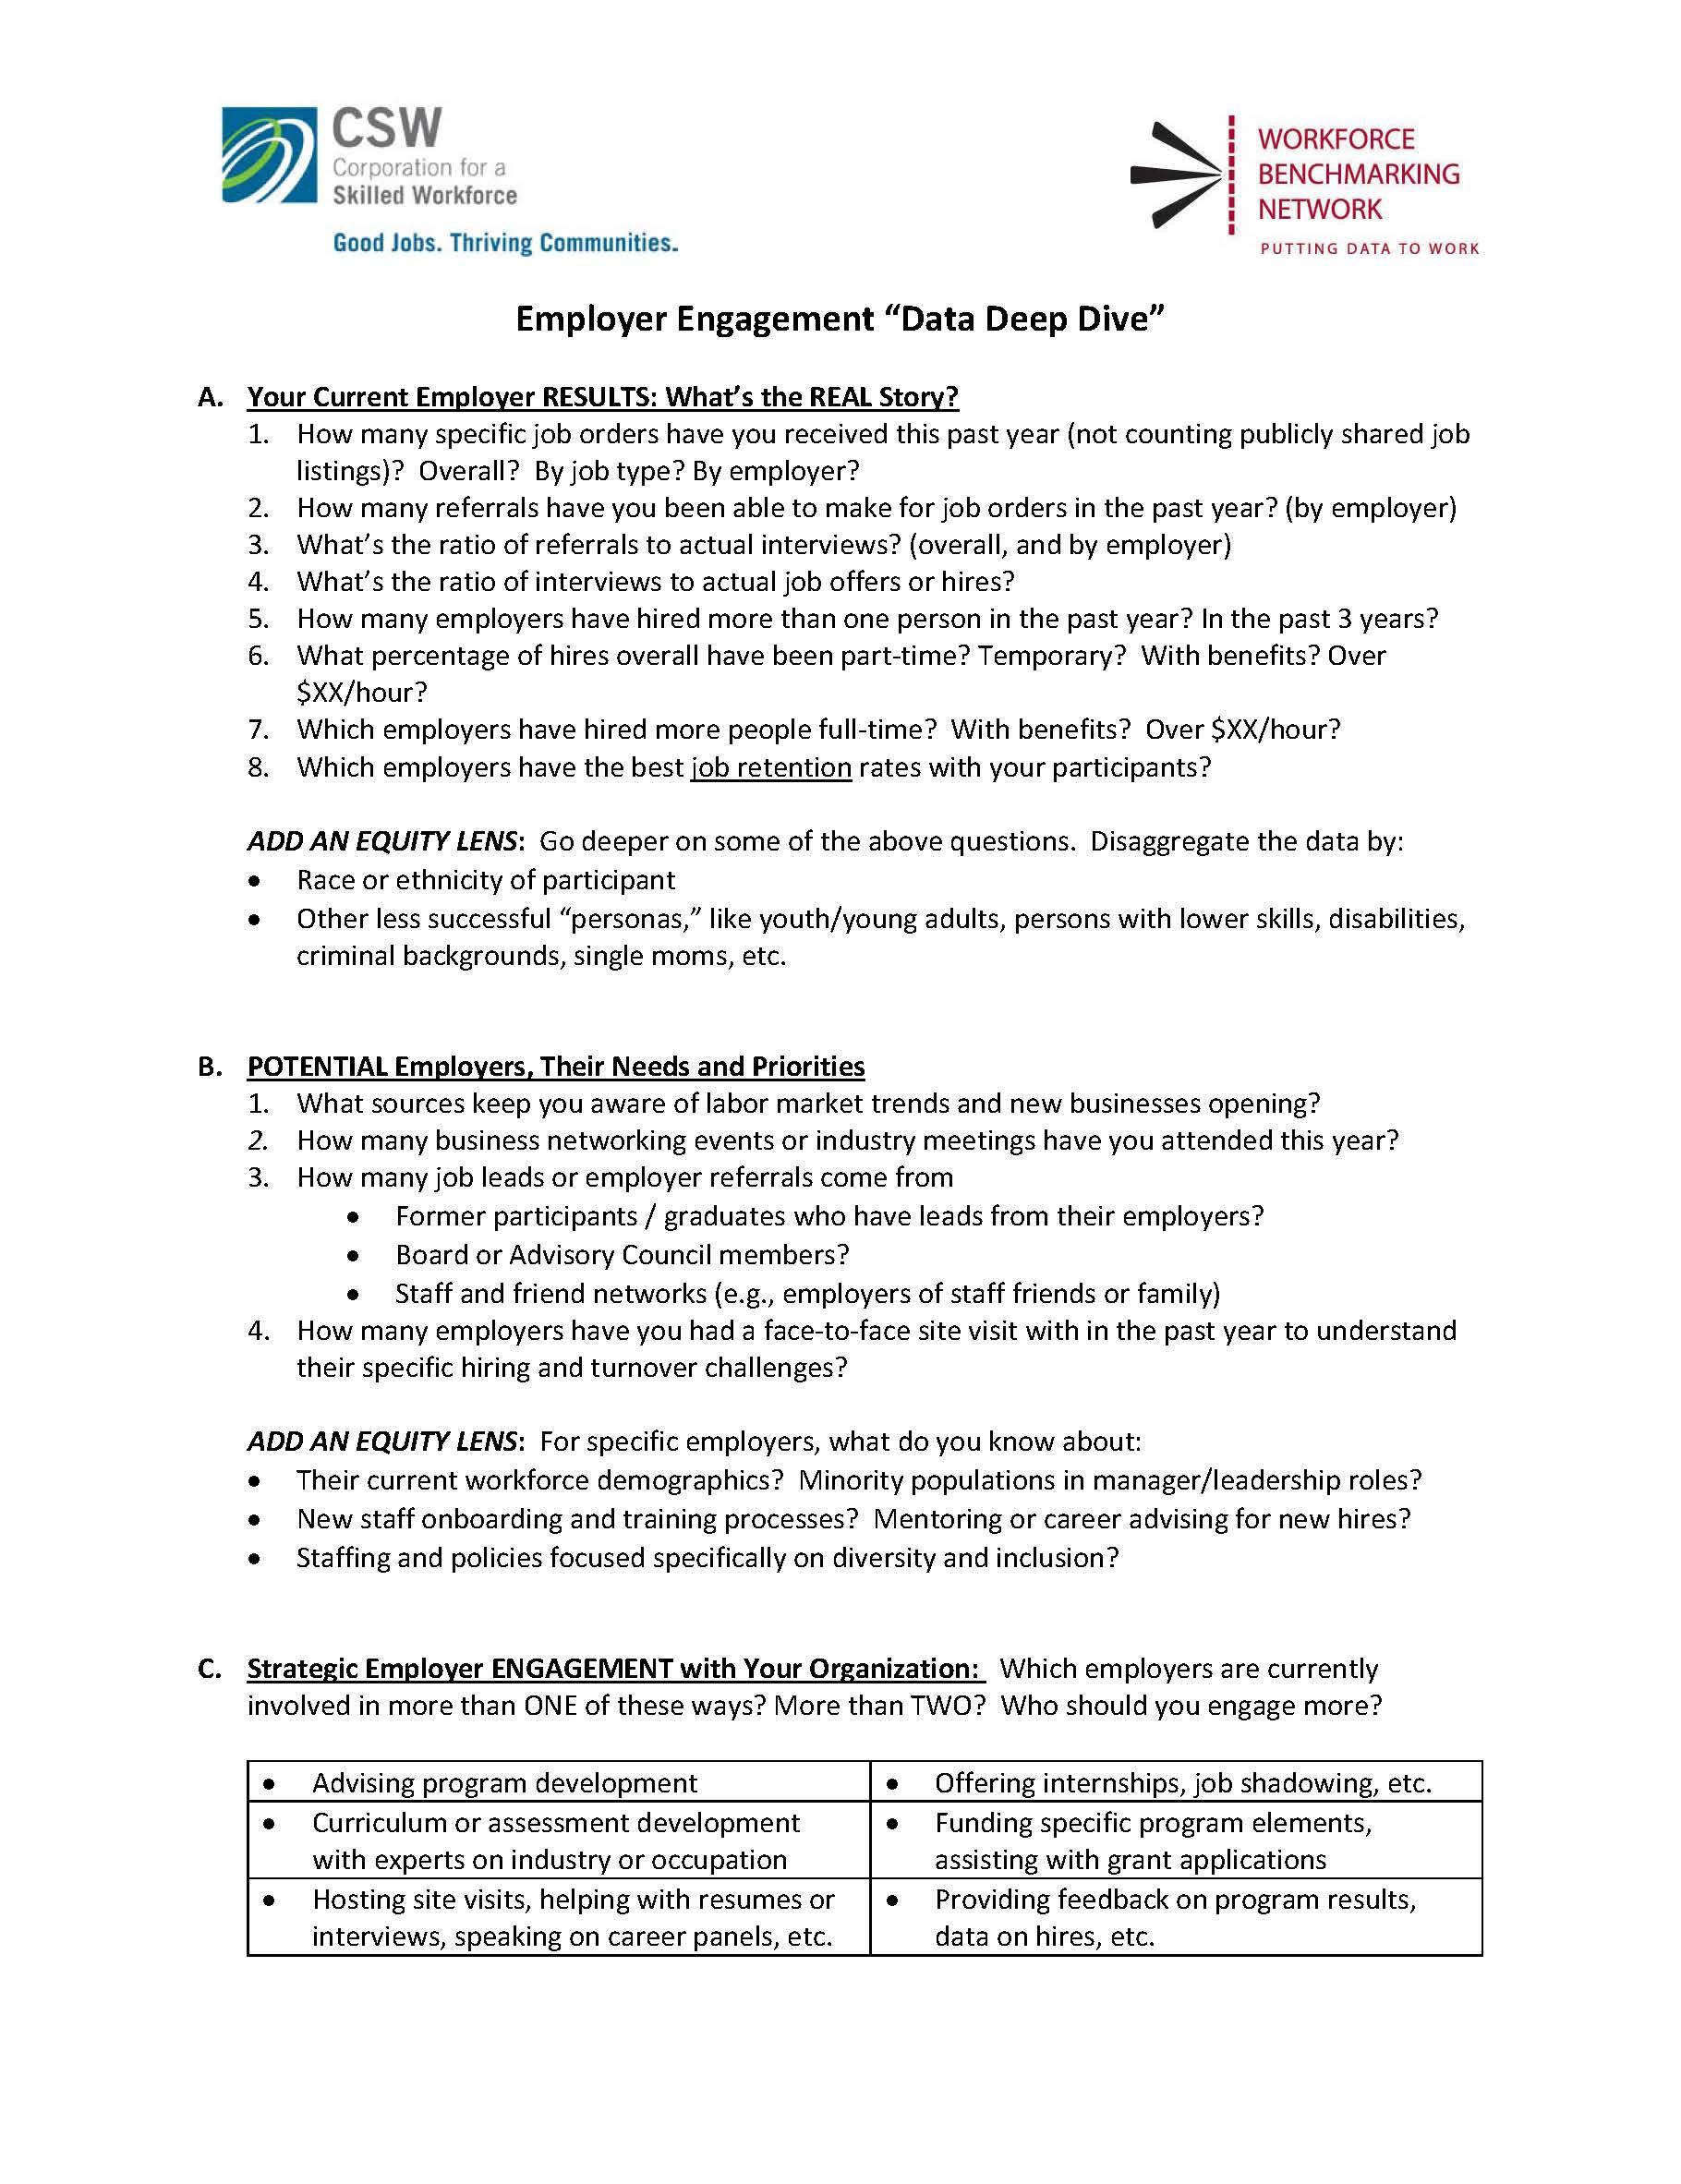 Employer Engagement Data & Action Planning